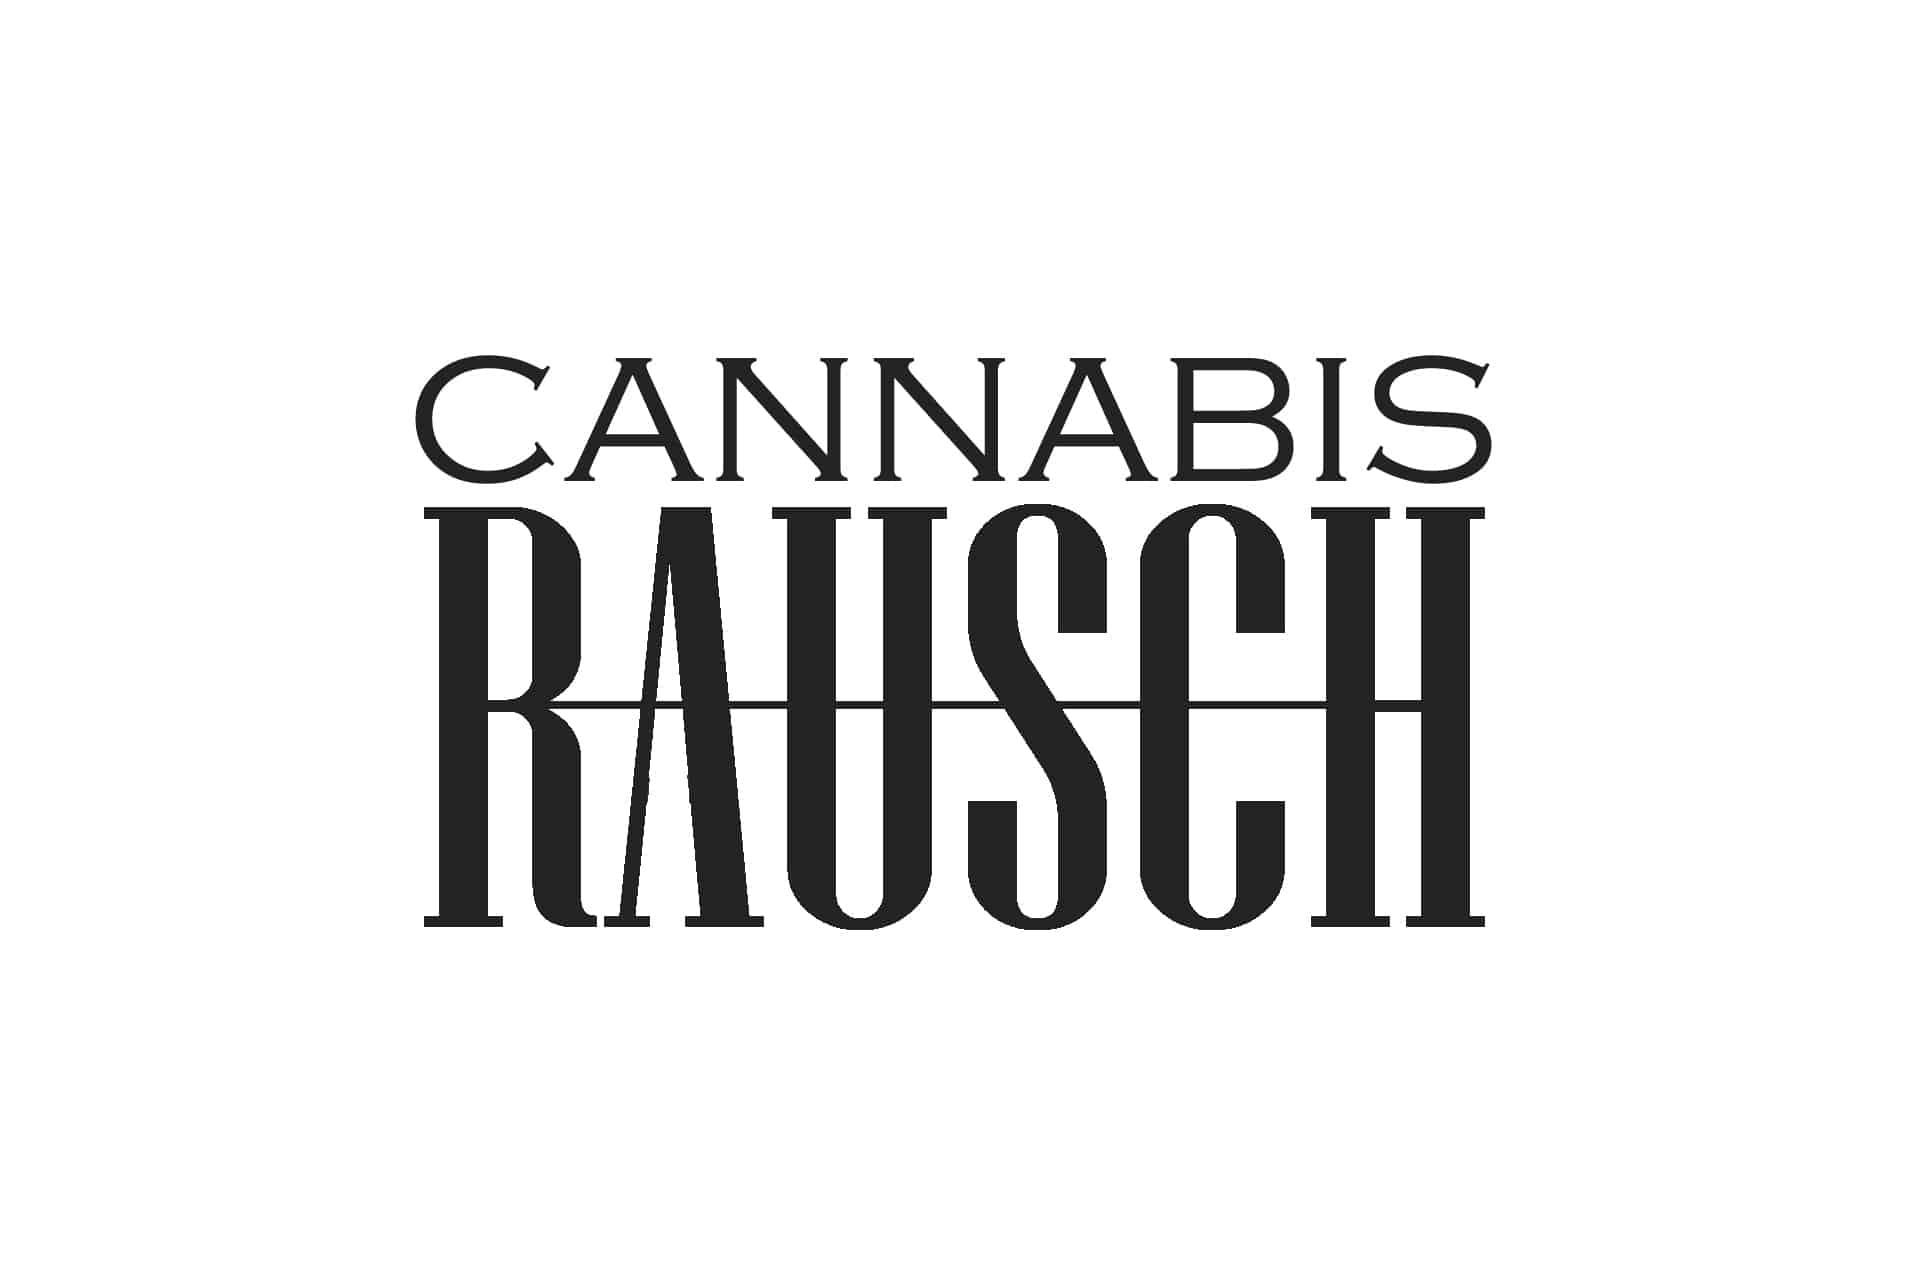 spenden ohne moos nichts los cannabis. Black Bedroom Furniture Sets. Home Design Ideas